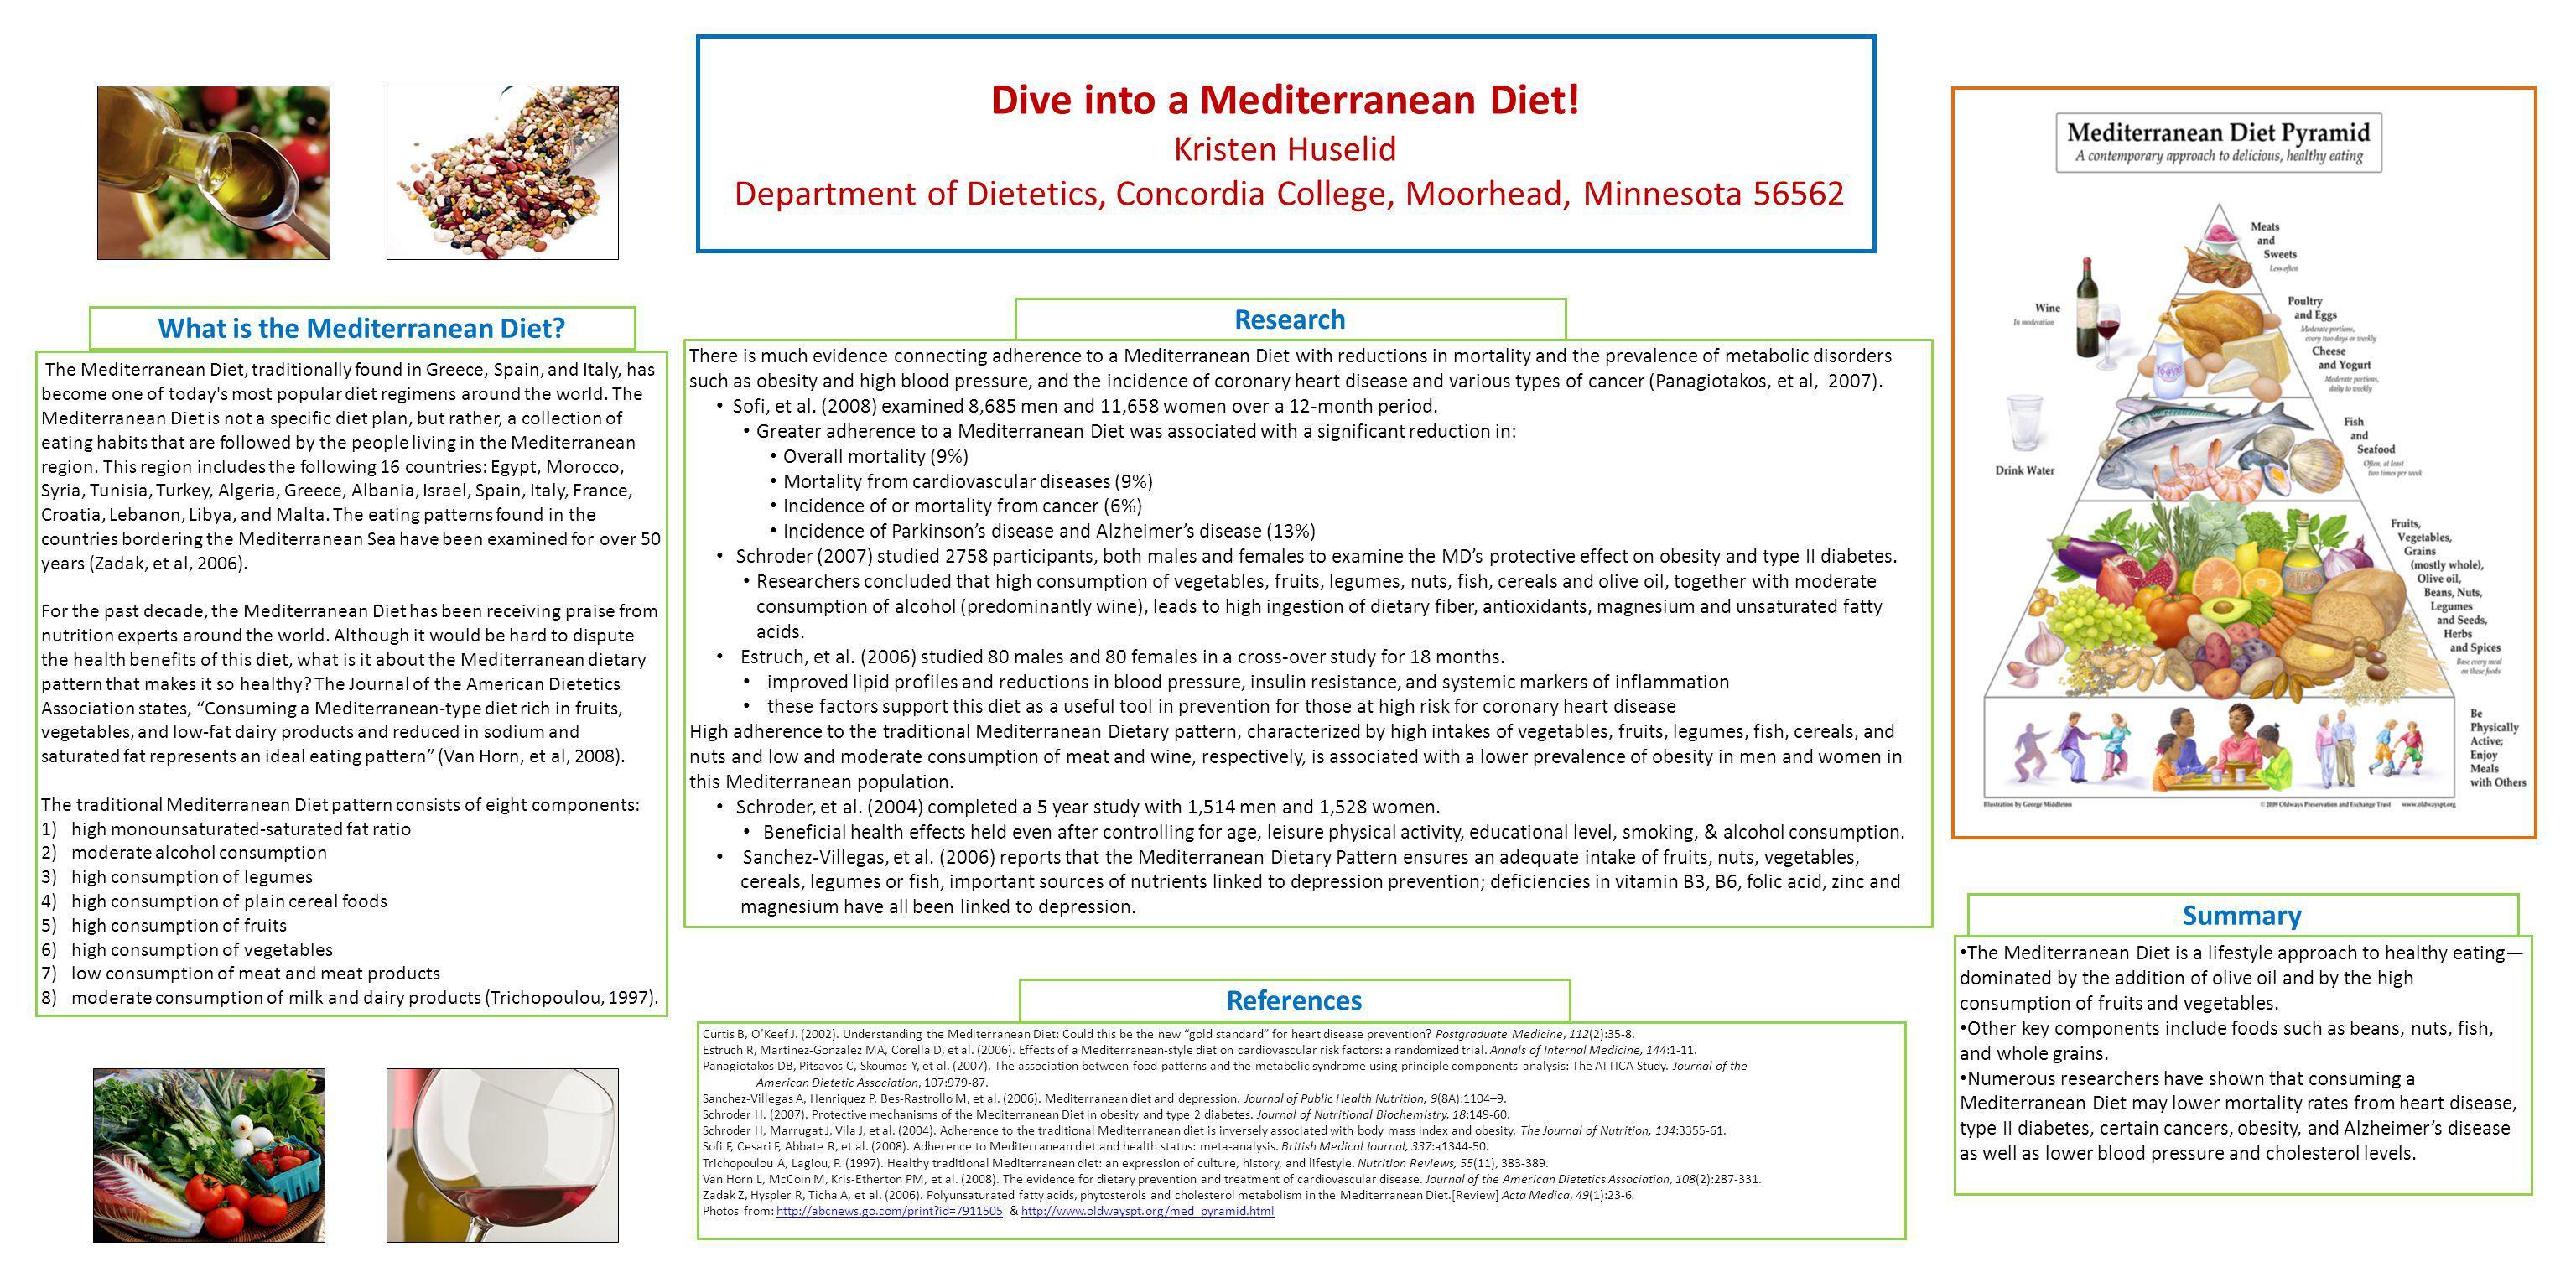 Dive into a Mediterranean Diet! Kristen Huselid Department of Dietetics, Concordia College, Moorhead, Minnesota 56562 The Mediterranean Diet, traditio